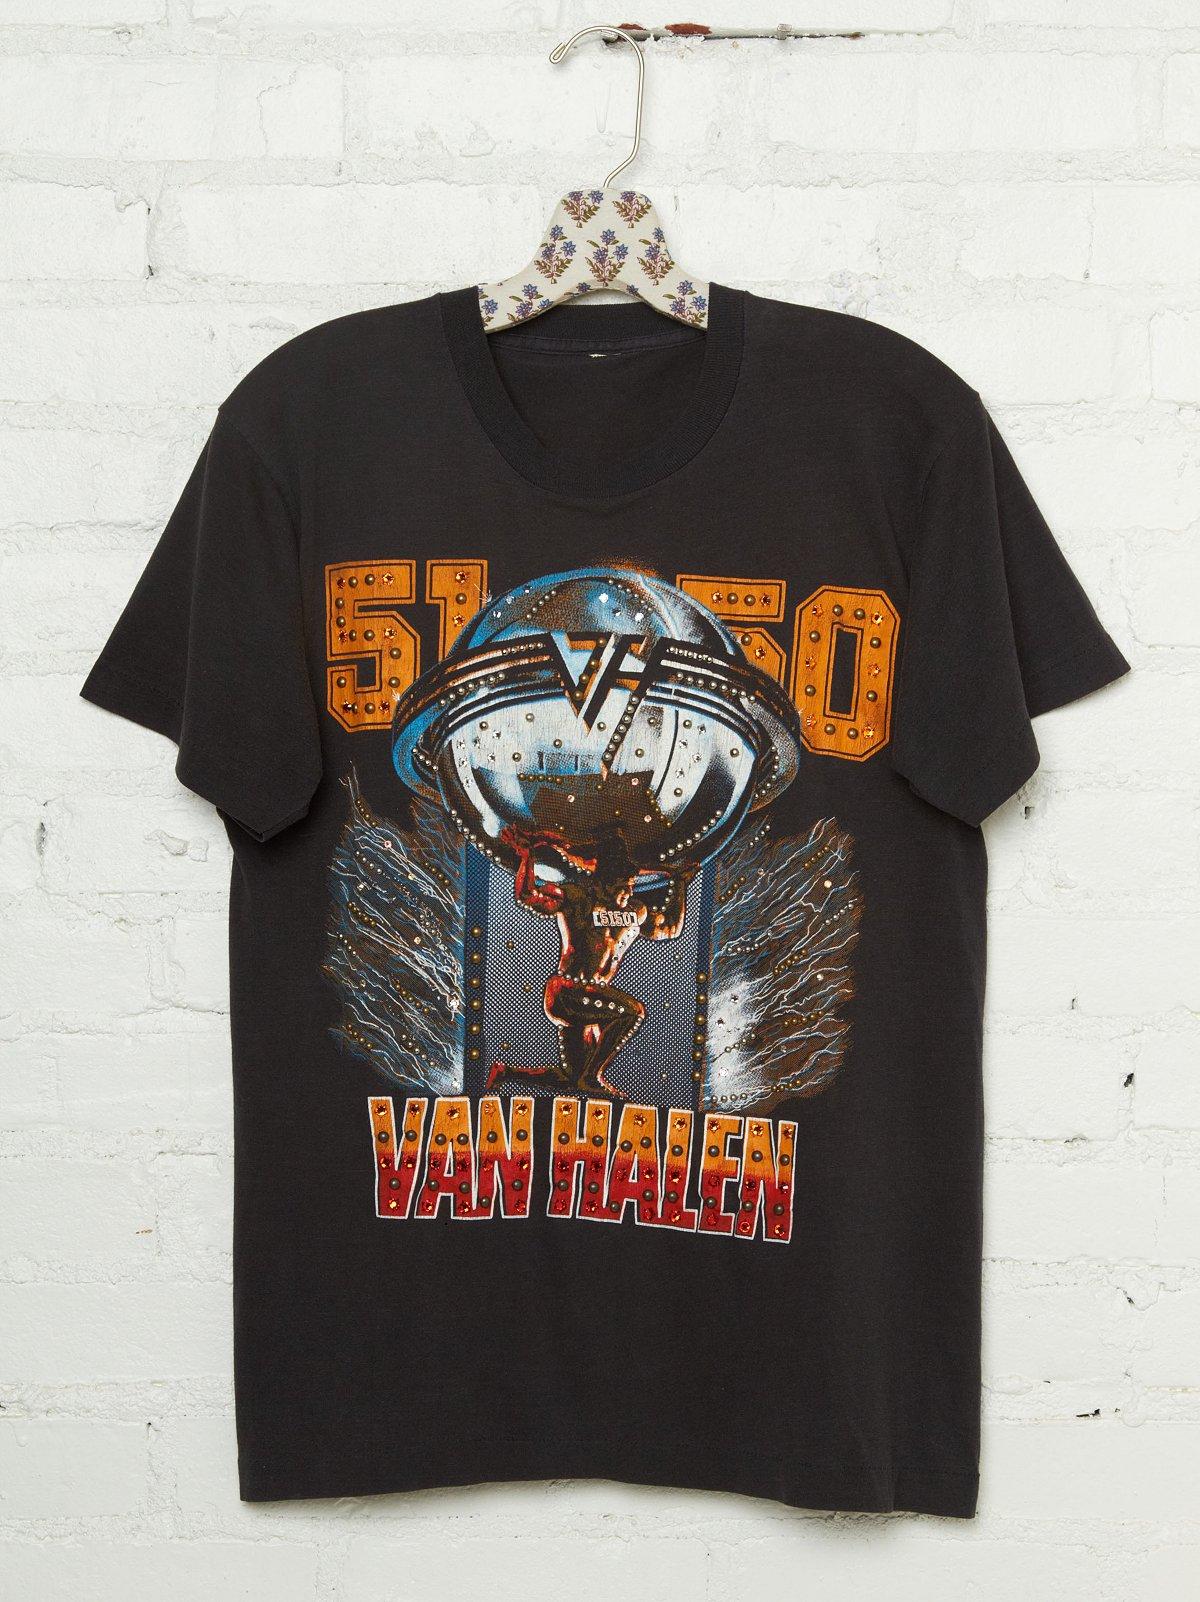 Vintage Studded Van Halen 5150 Tee